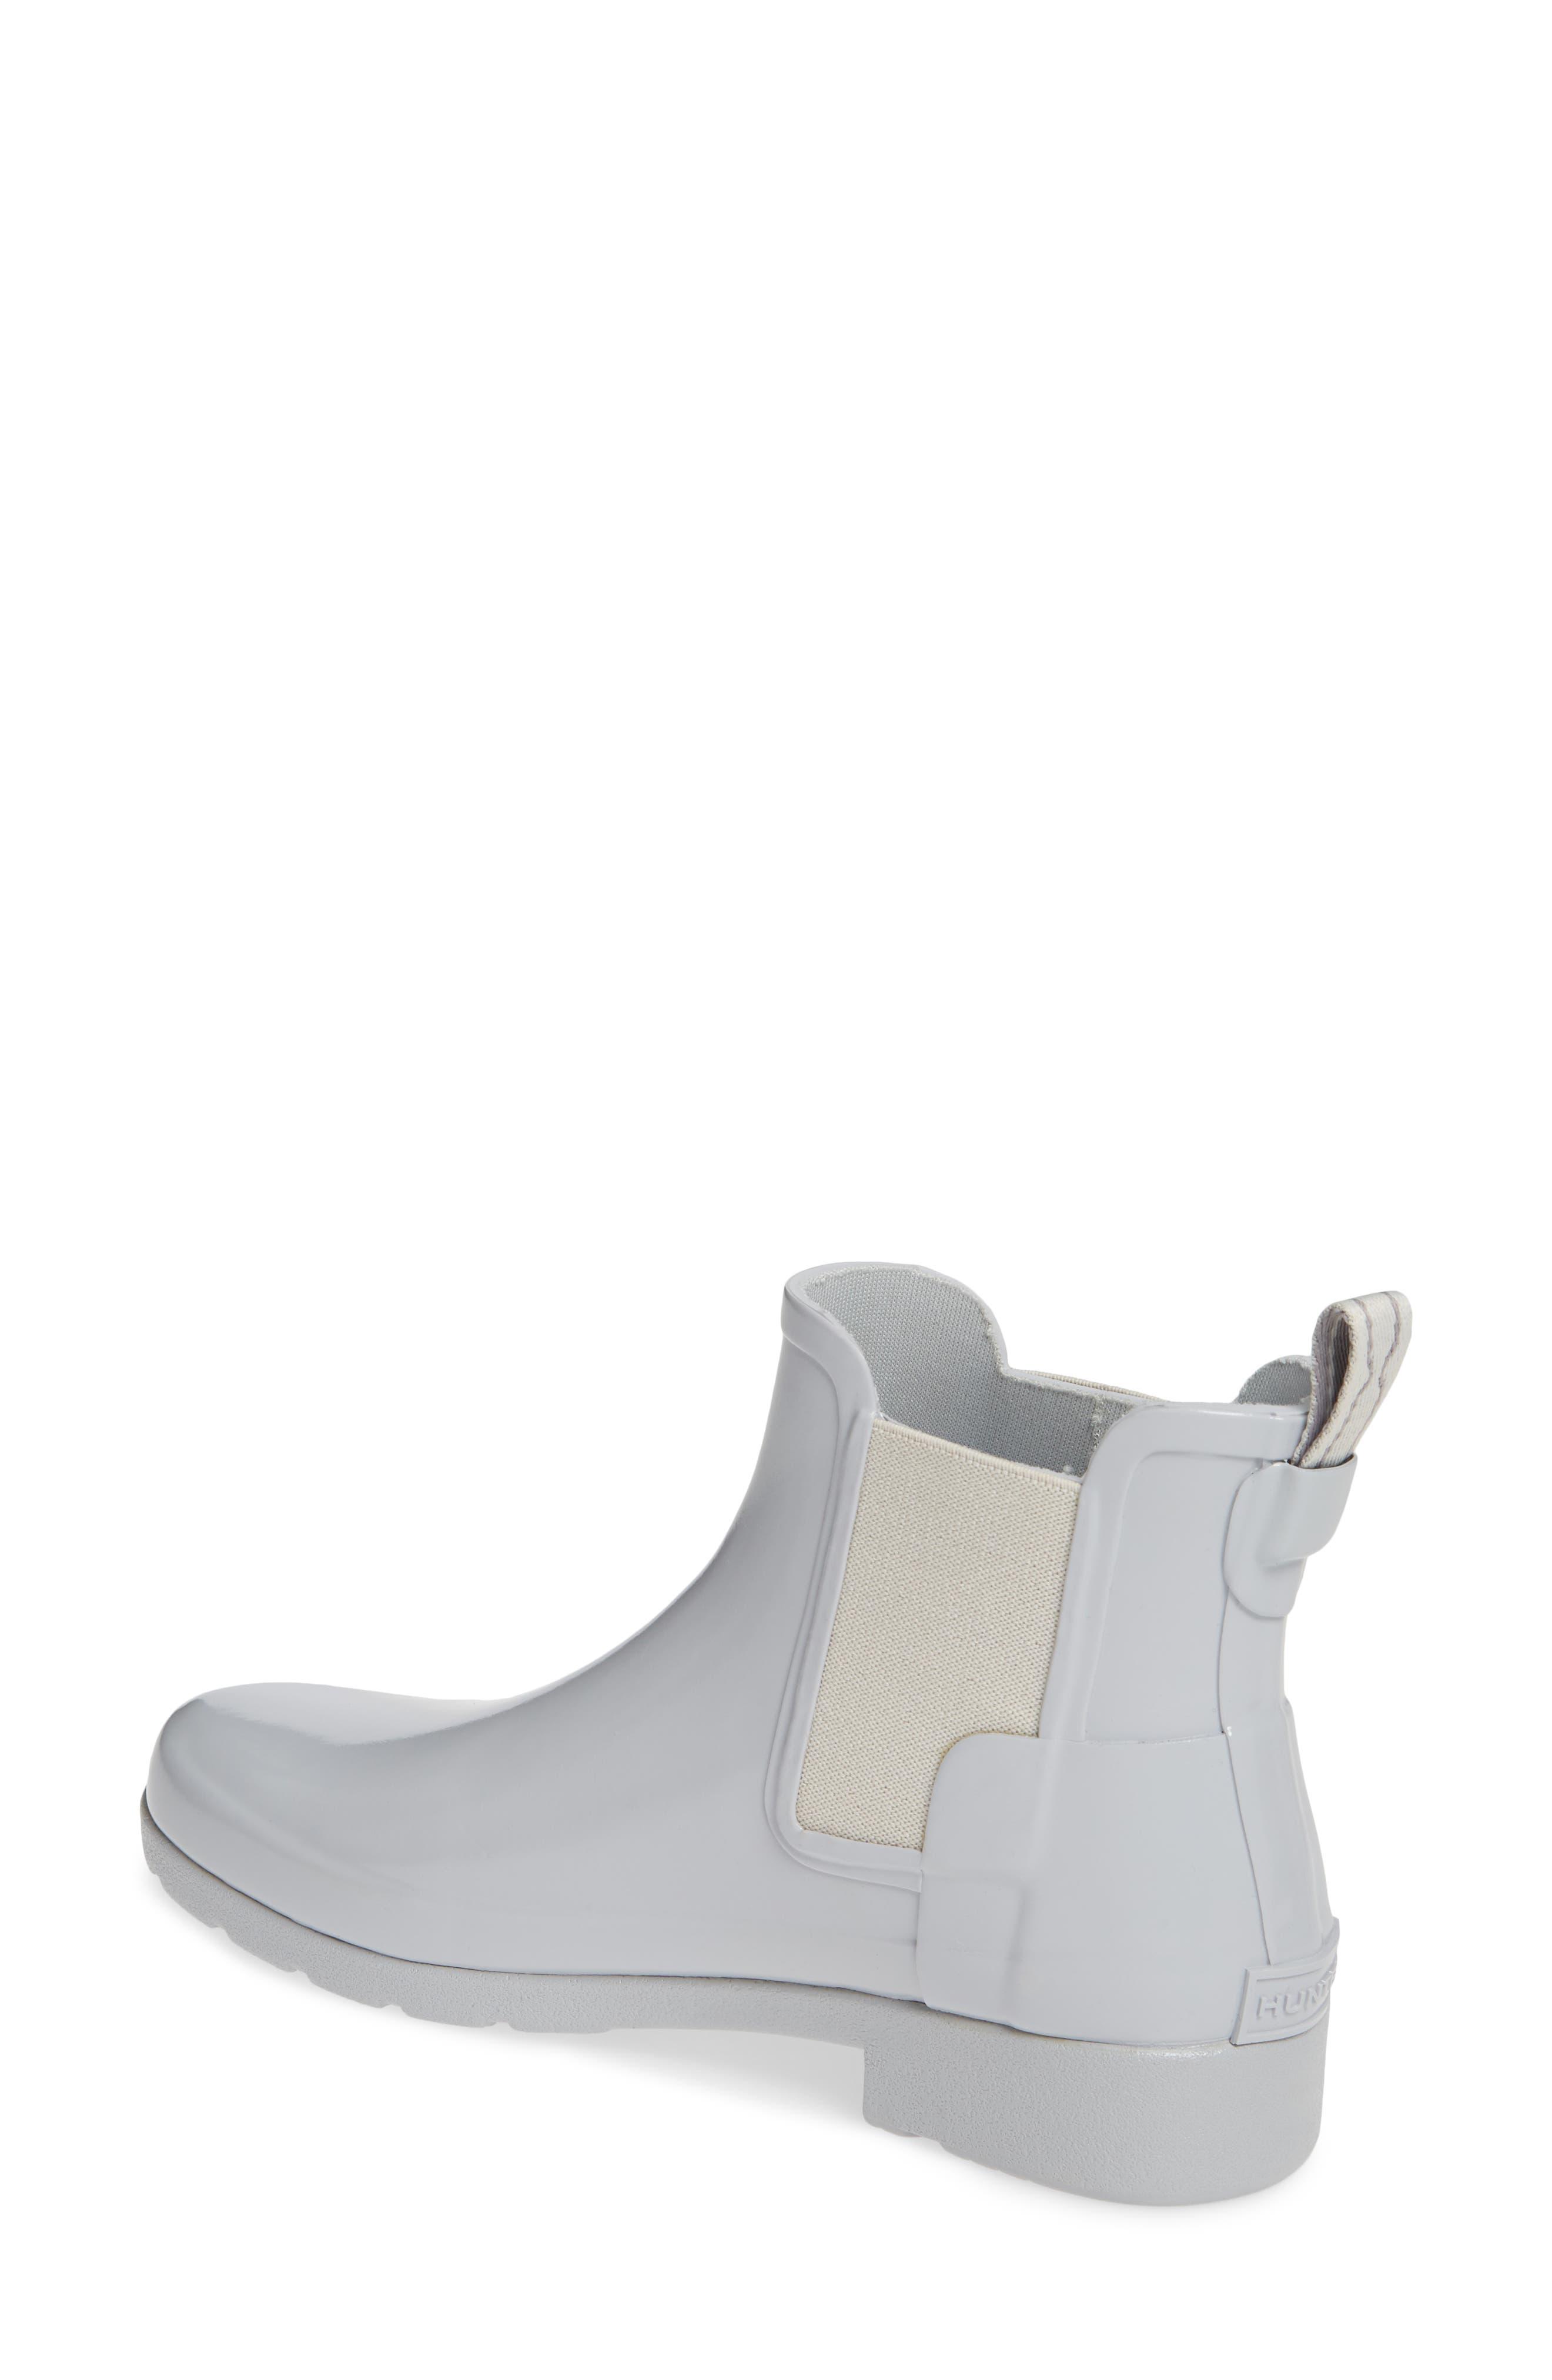 HUNTER, Original Refined Chelsea Waterproof Rain Boot, Alternate thumbnail 2, color, 074